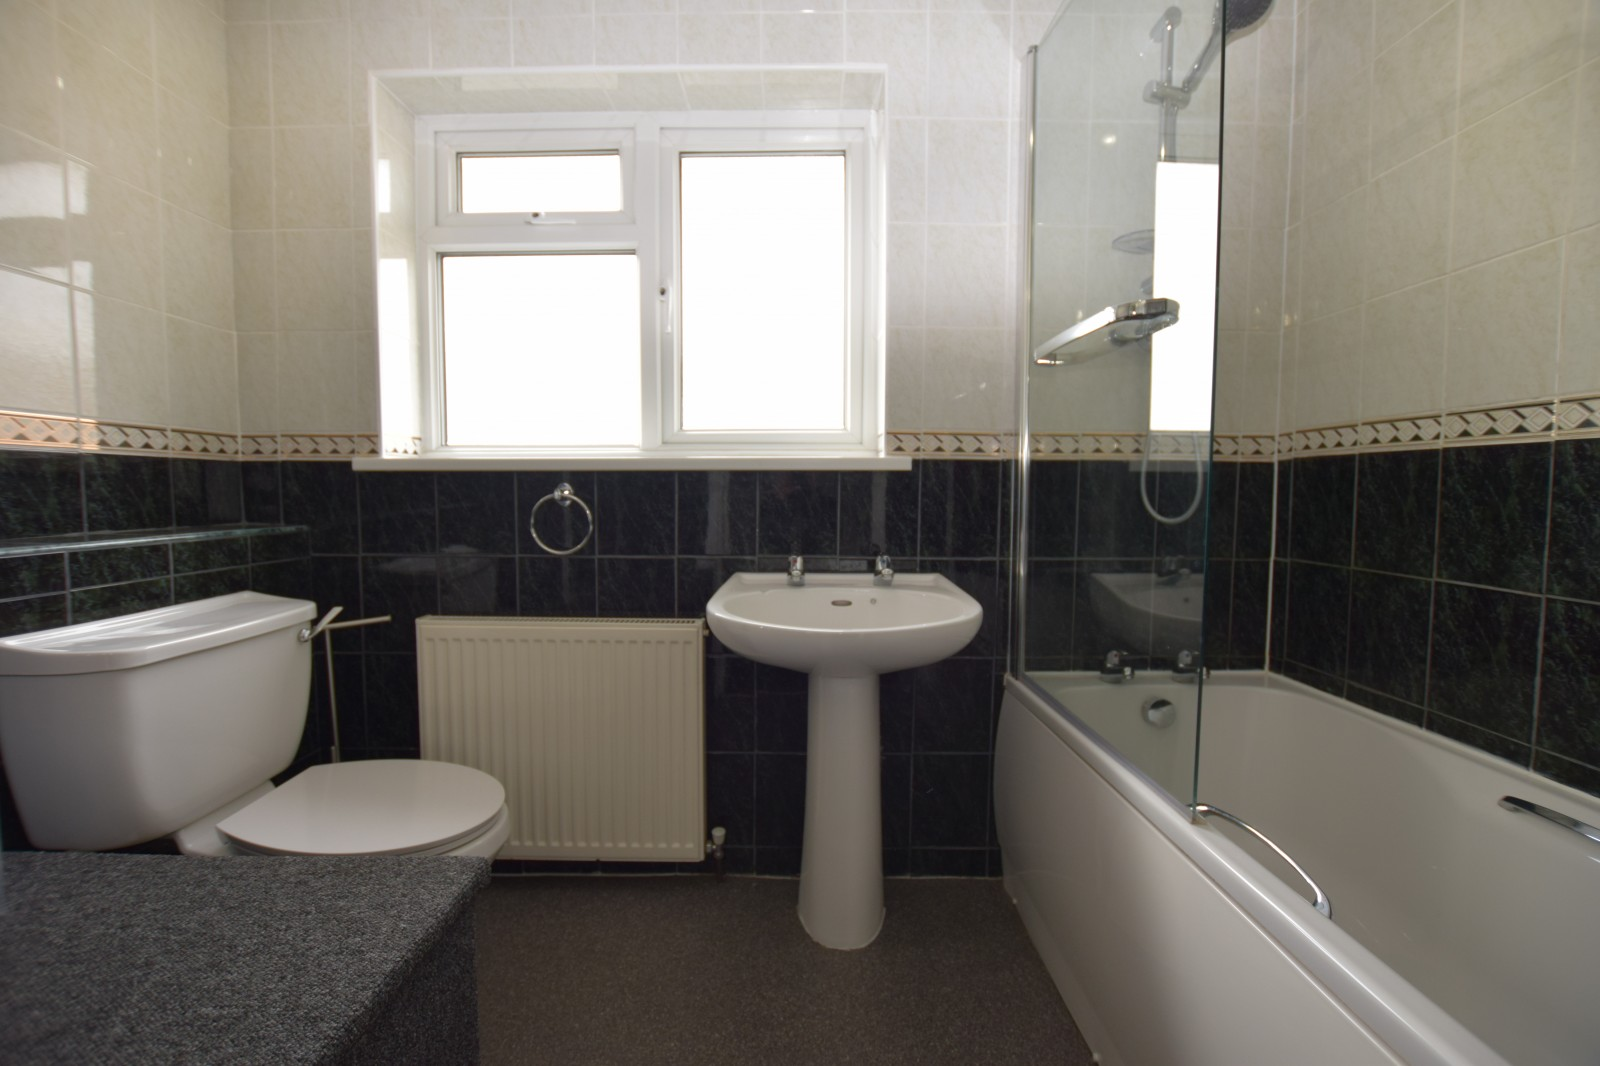 Maisonette to rent in Bognor Regis